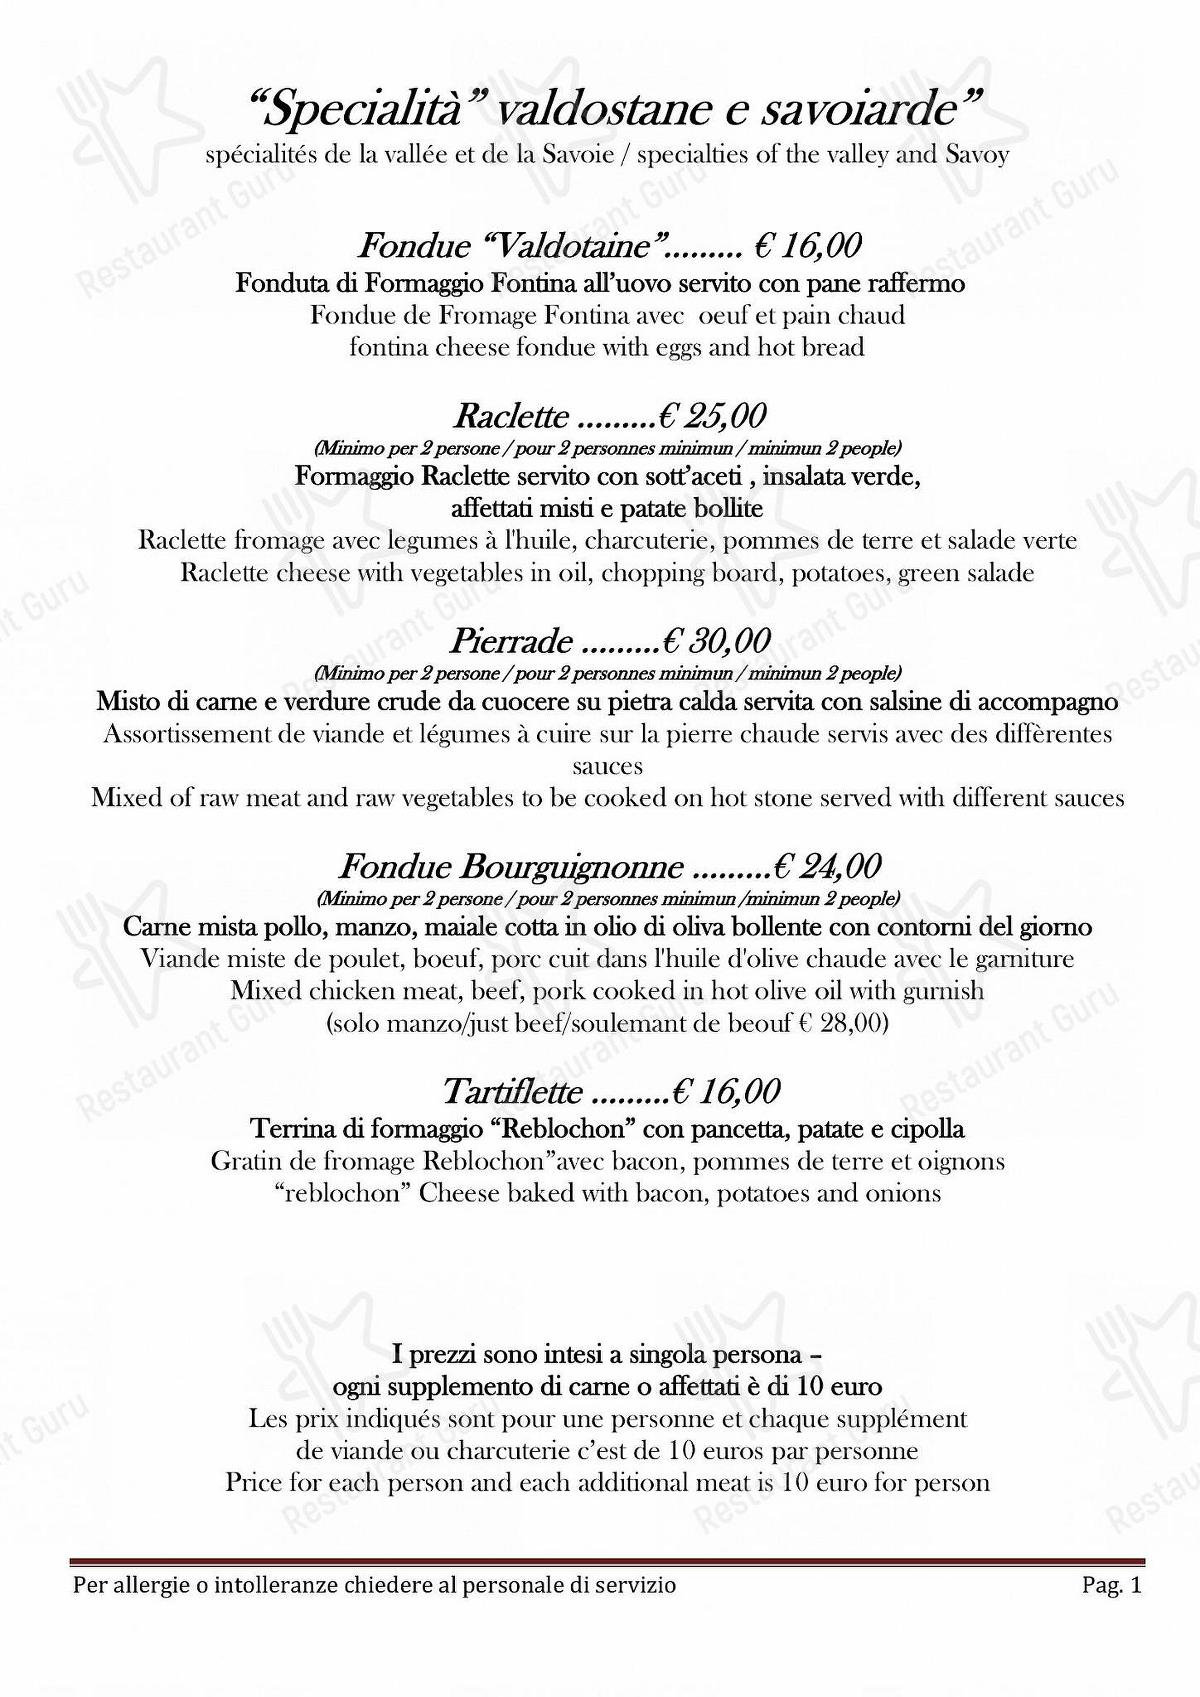 Guarda il menu di Taverna Coppapan & Pizzeria Le Dahu